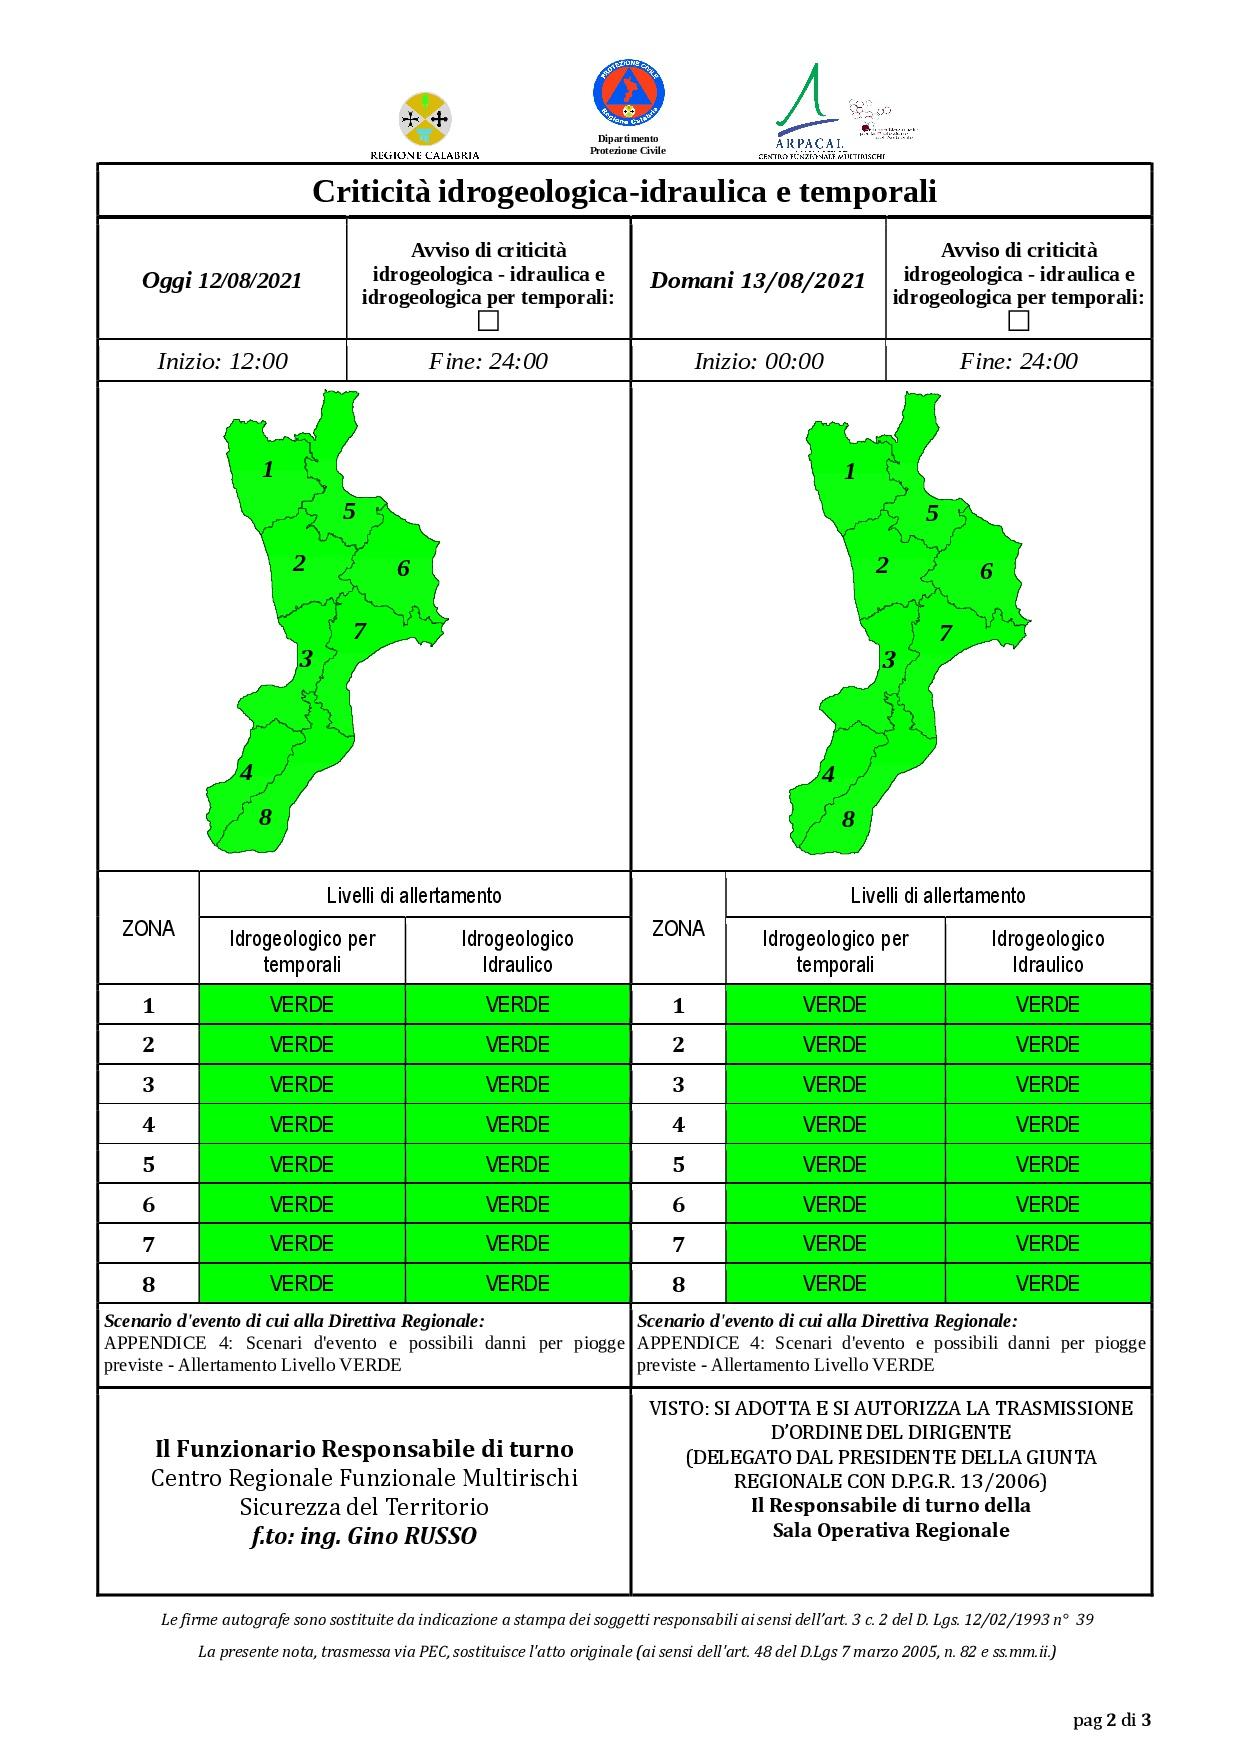 Criticità idrogeologica-idraulica e temporali in Calabria 12-08-2021